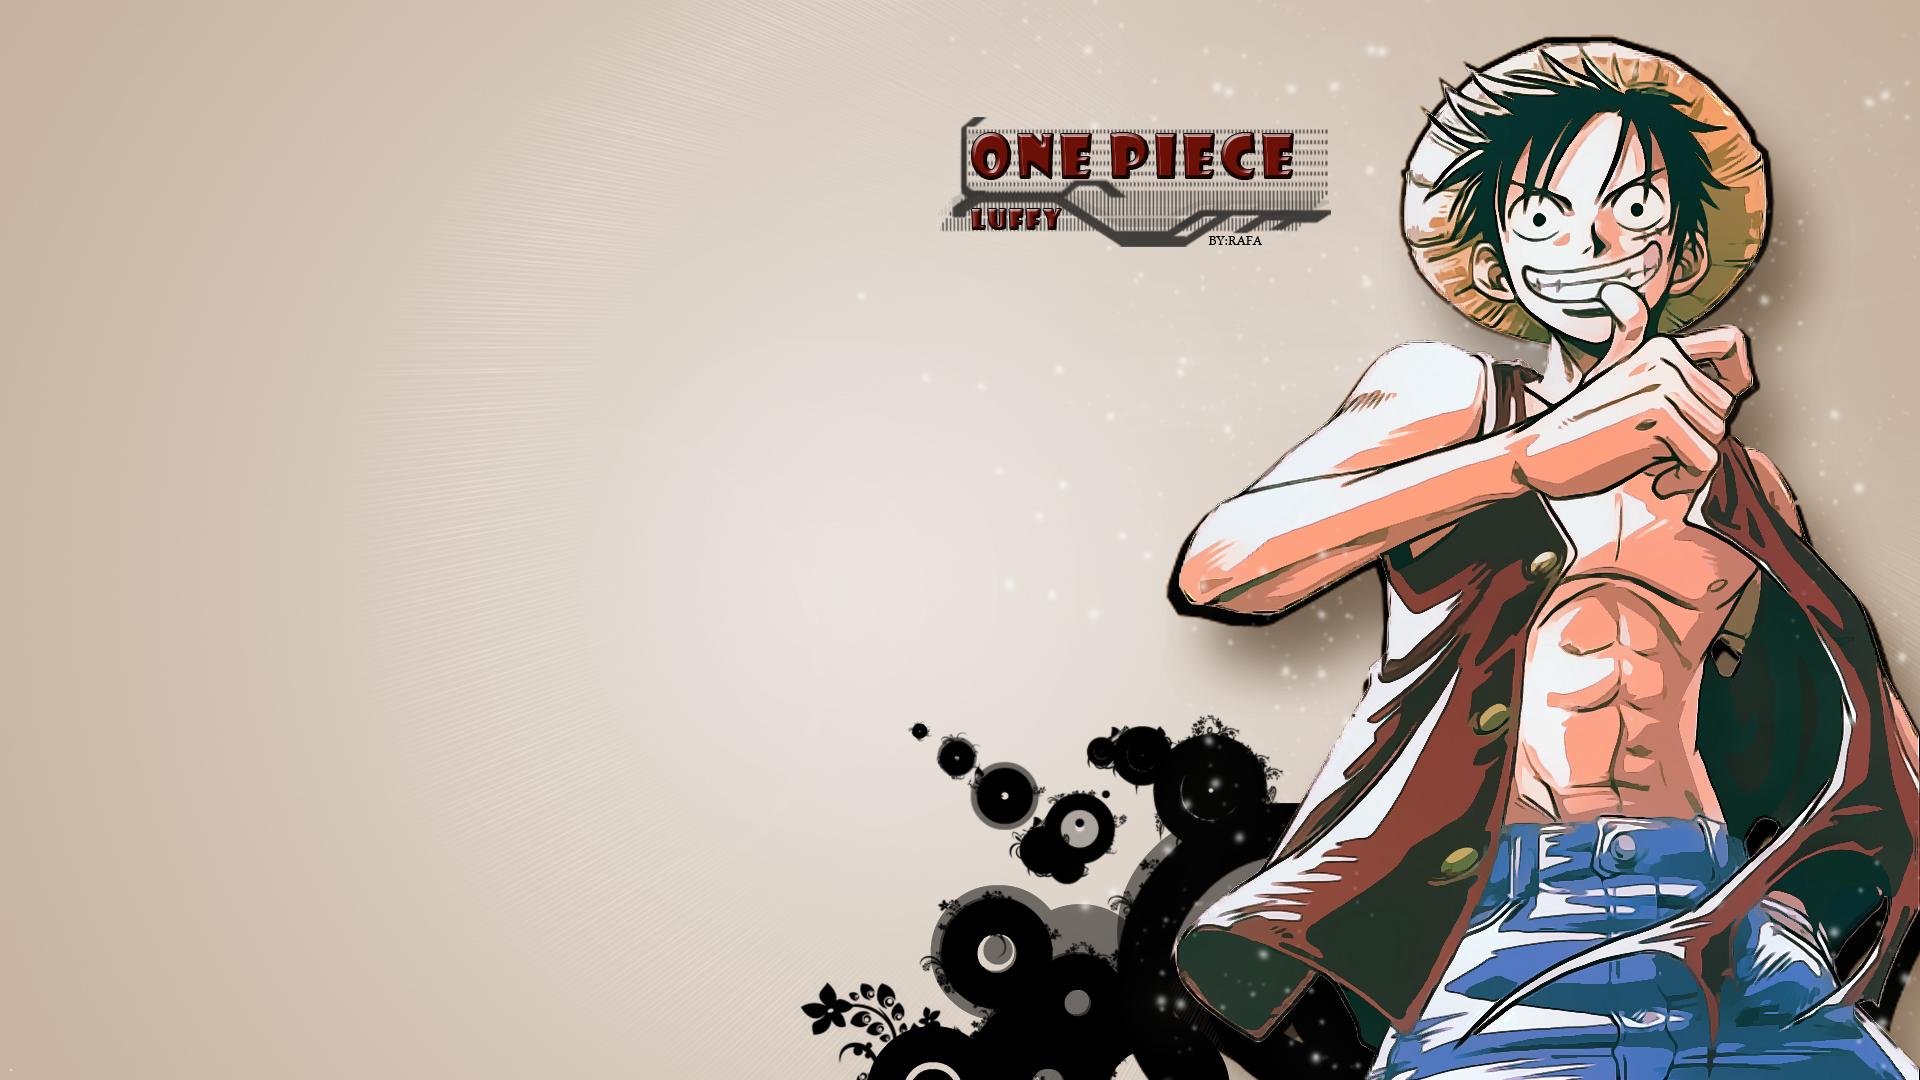 Luffy One Piece Wallpaper HD 1920x1080